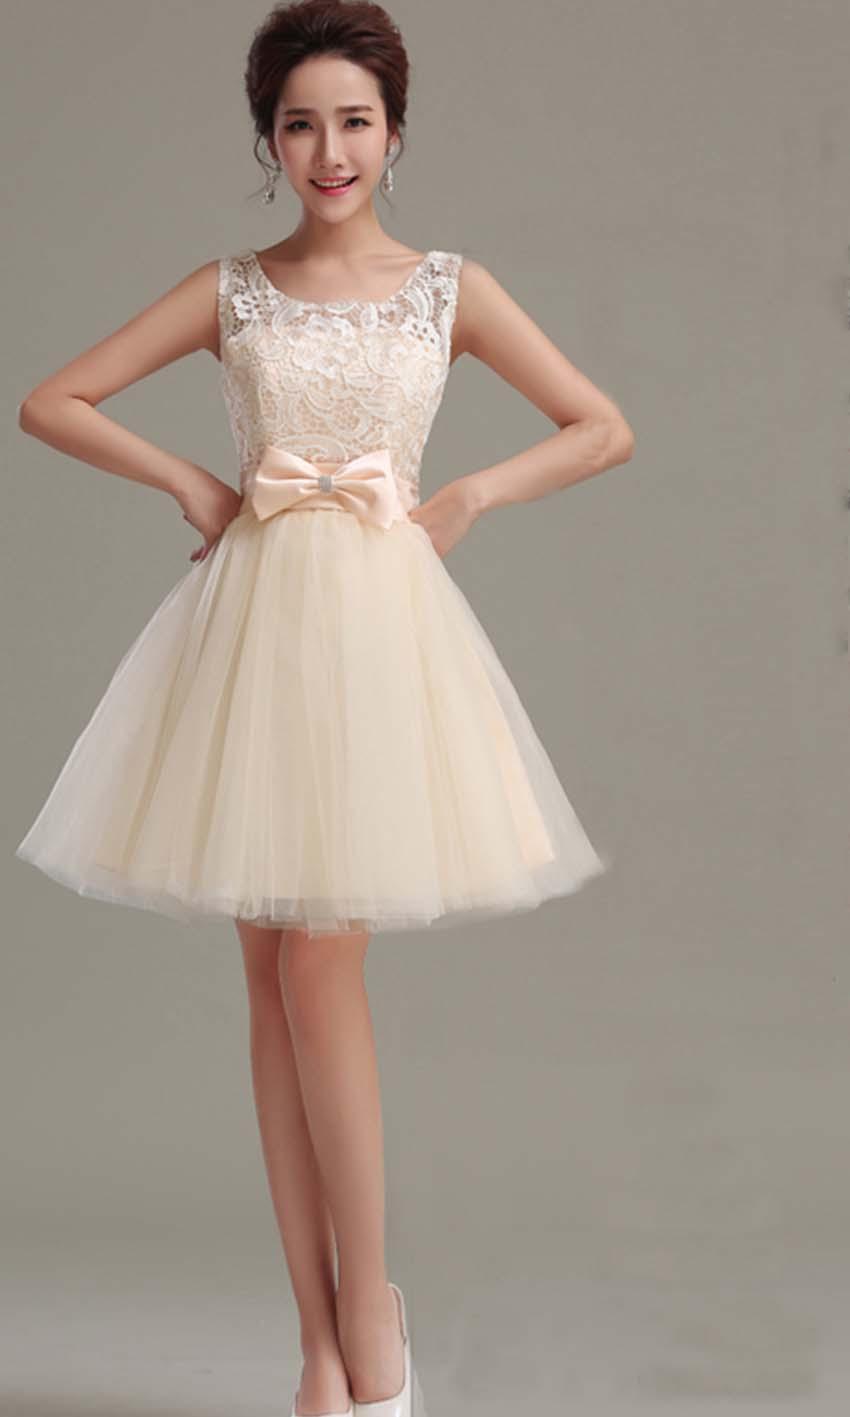 Cute Beige Retro Bow Knot Short Prom Gown KSP348 KSP348